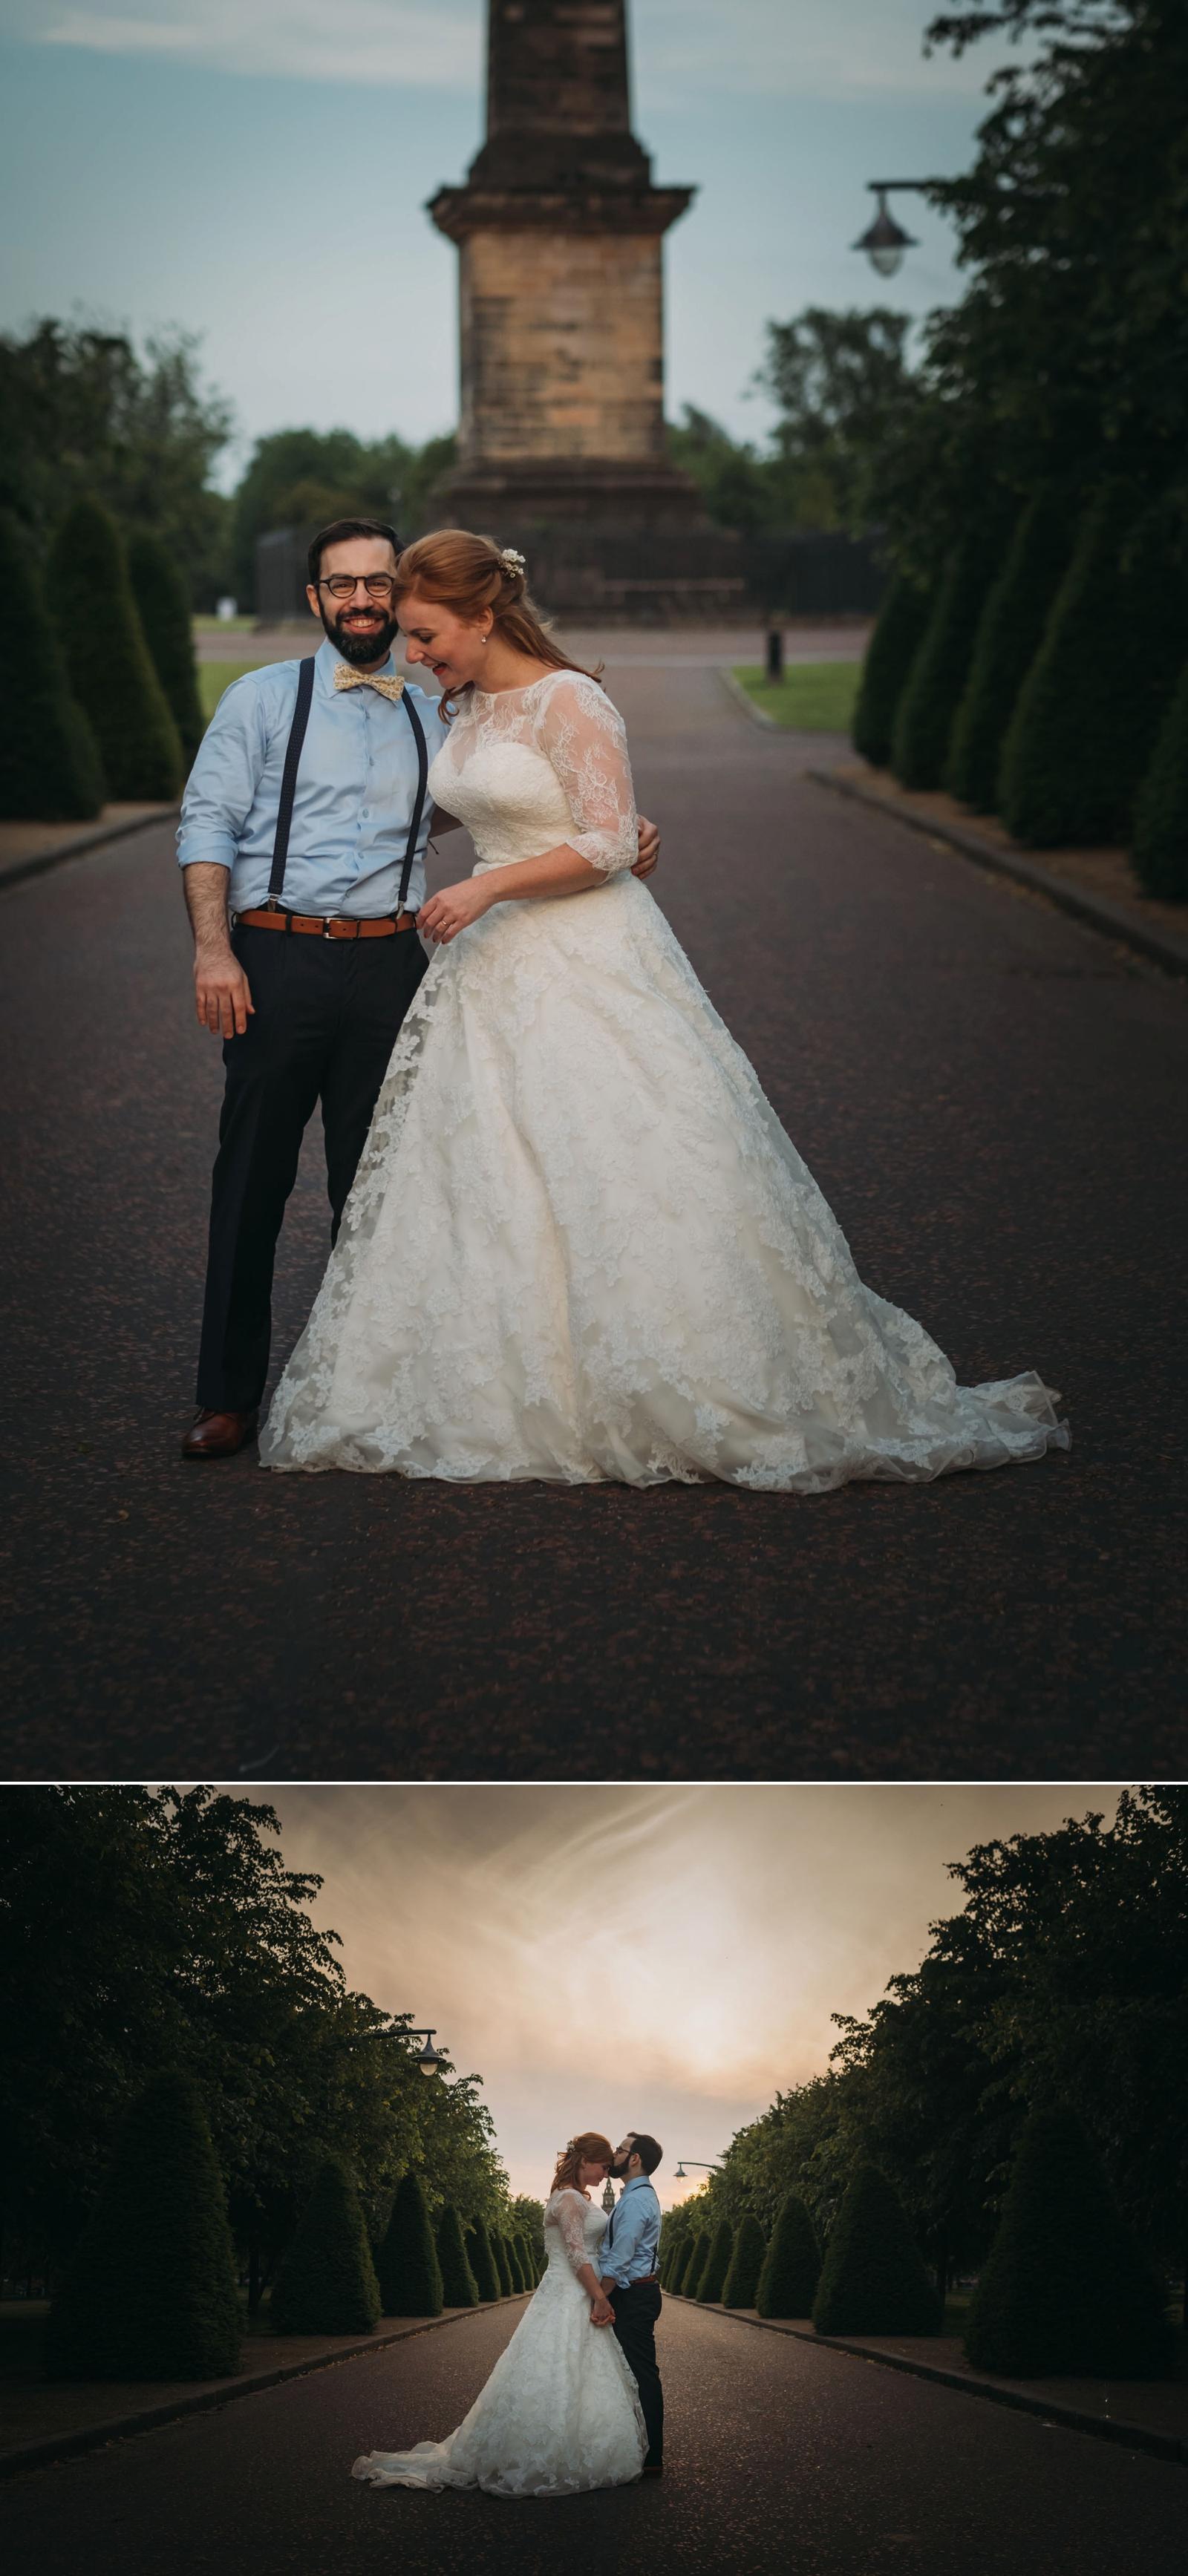 Gillian-Evan-West-Brewery-Jo-Donaldson-Photography-686.jpg